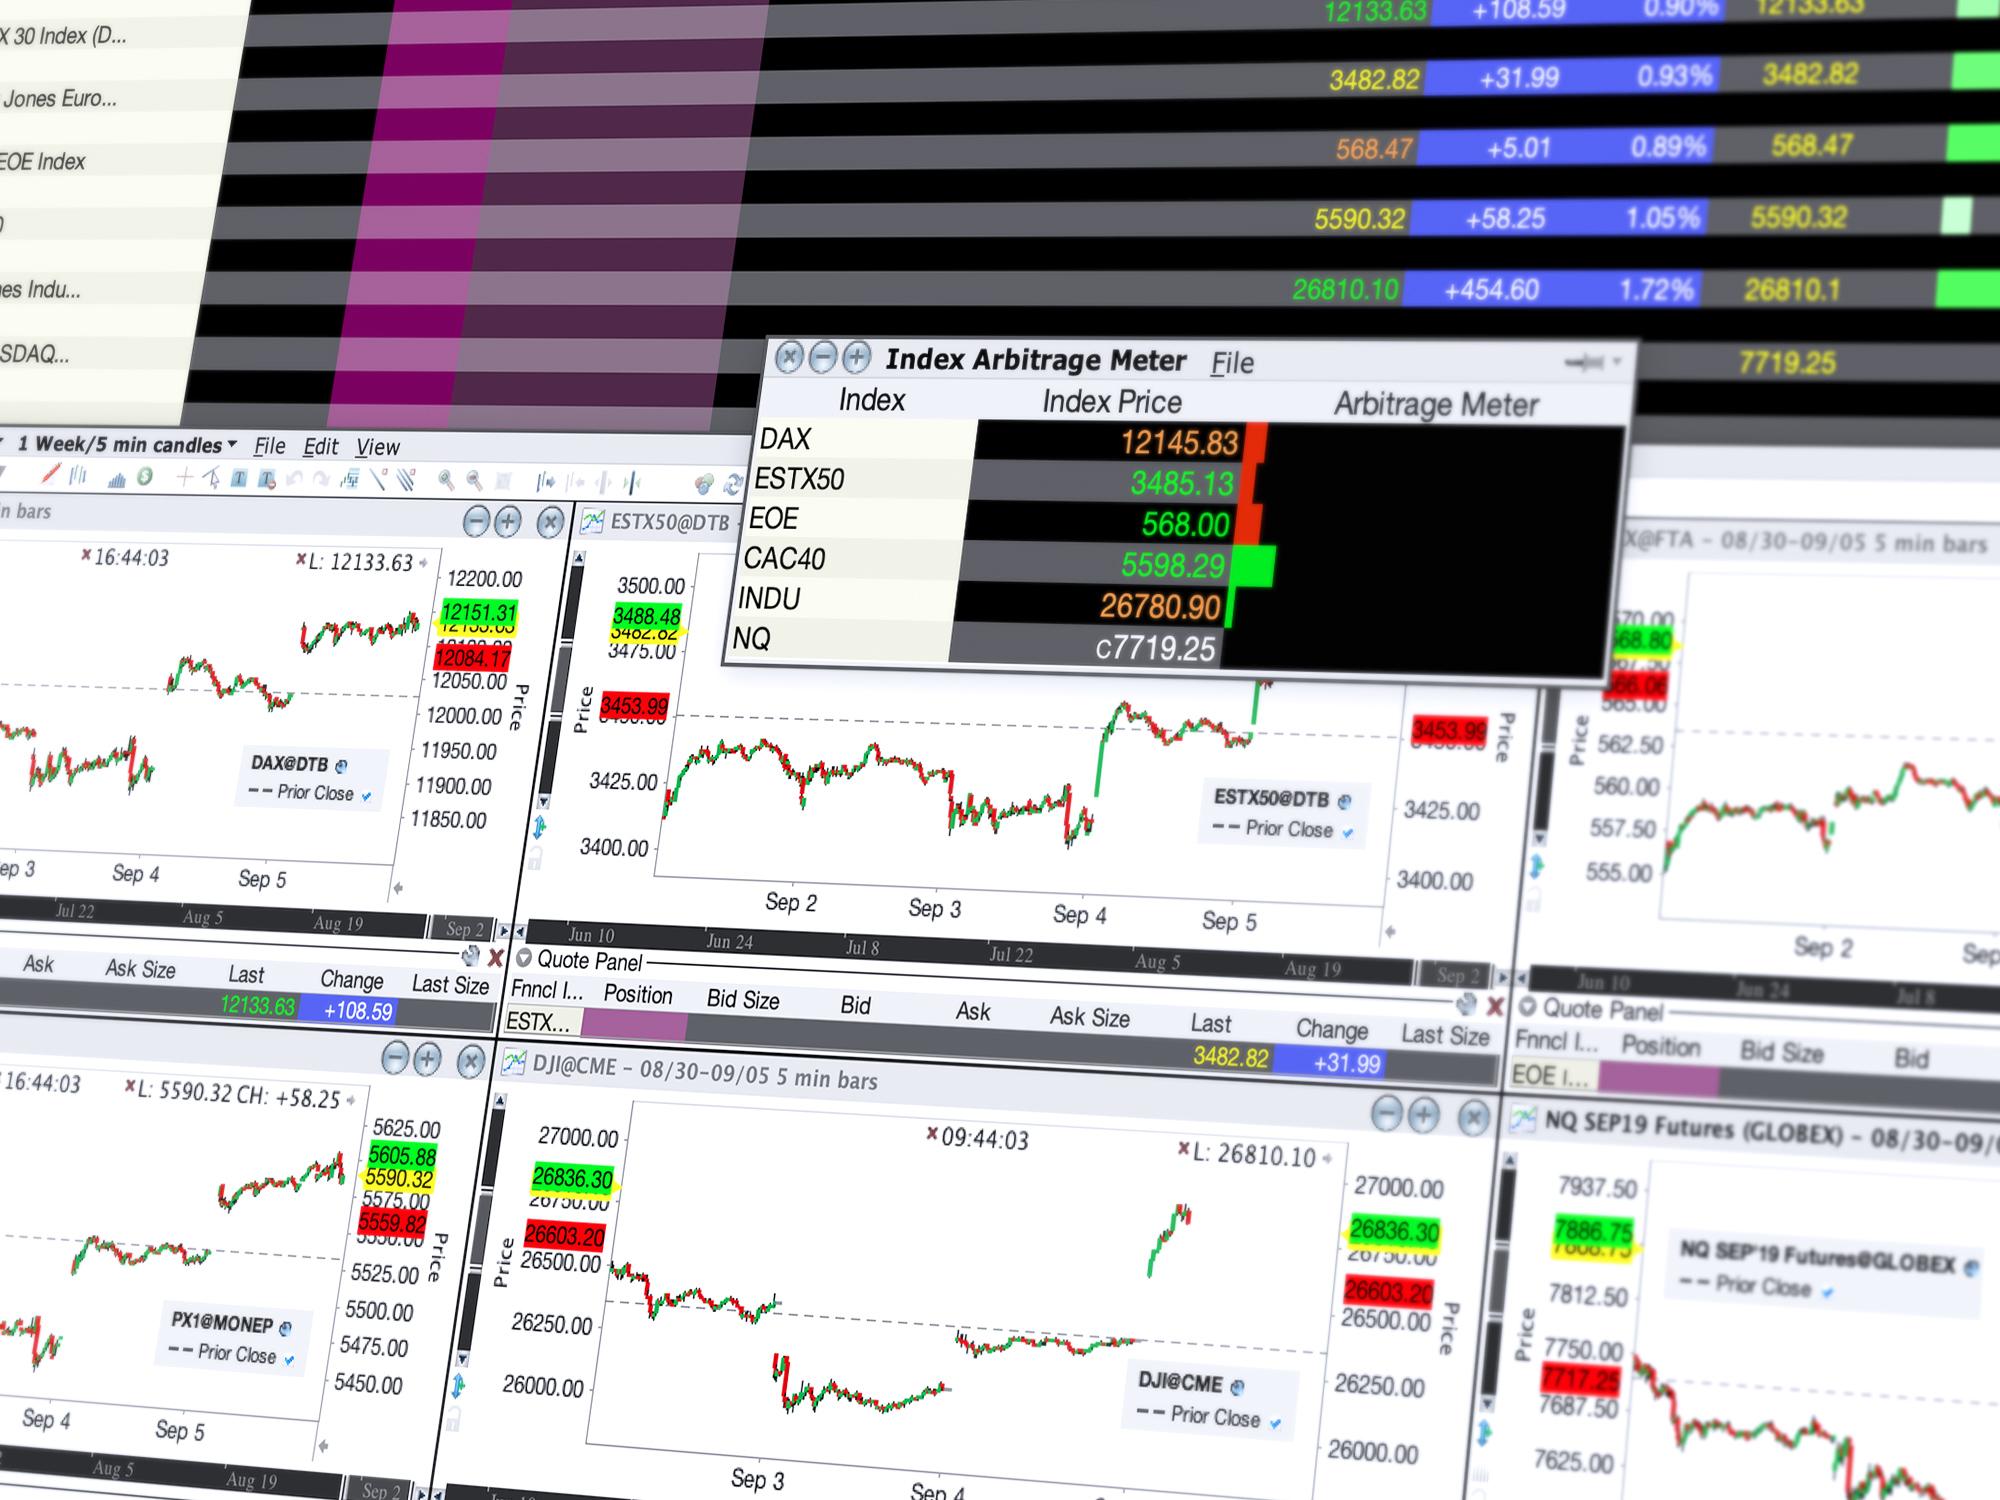 Futures handelen - analyseer strategieën Index Arbitrage Meter